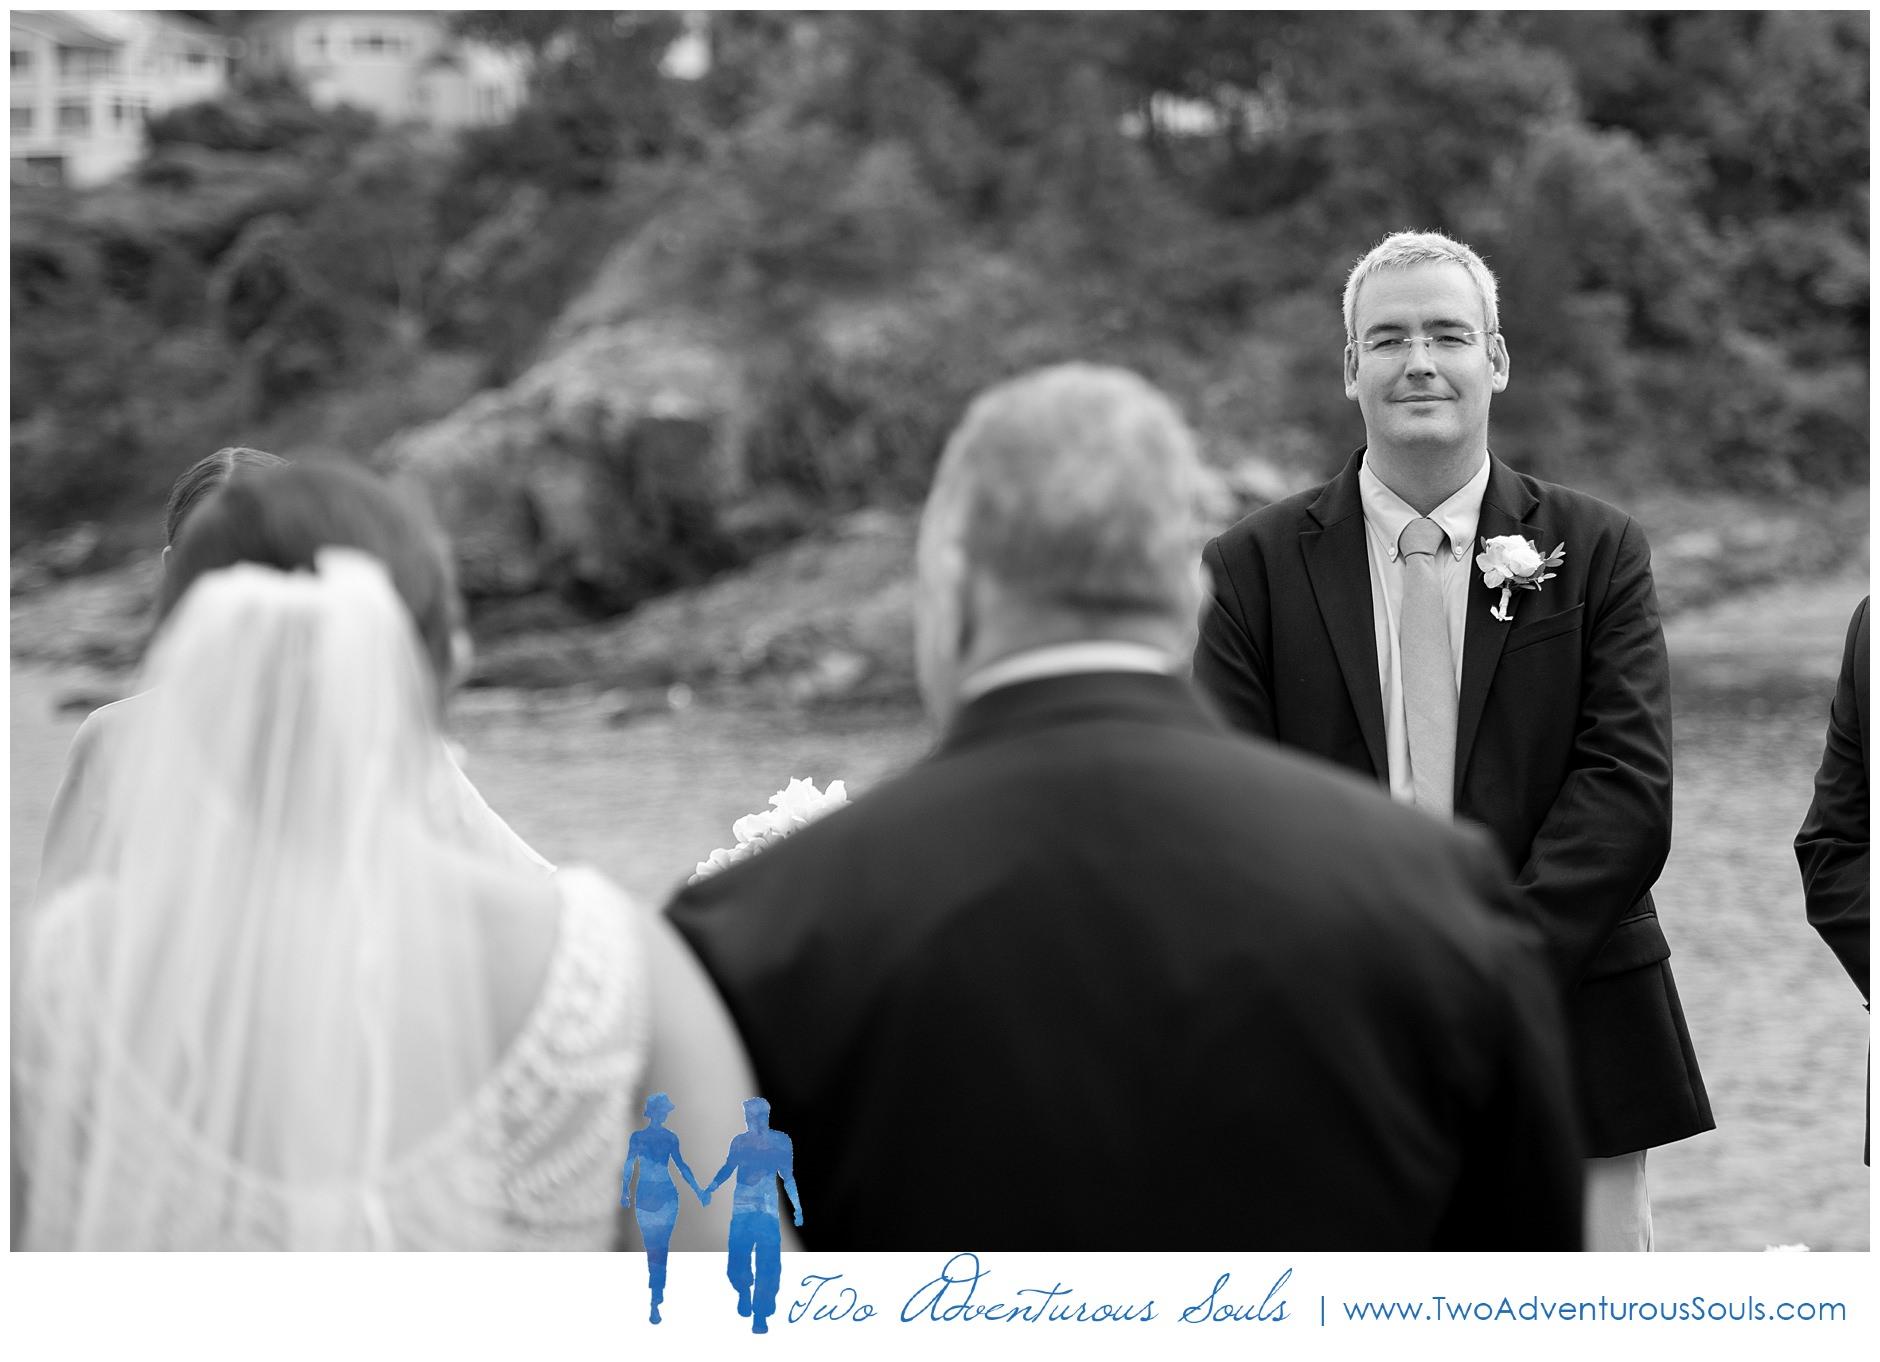 Maine Wedding Photographers, Ogunquit Wedding Photographers, Maine Elopement Photographers, Two Adventurous Souls-080619_0011.jpg